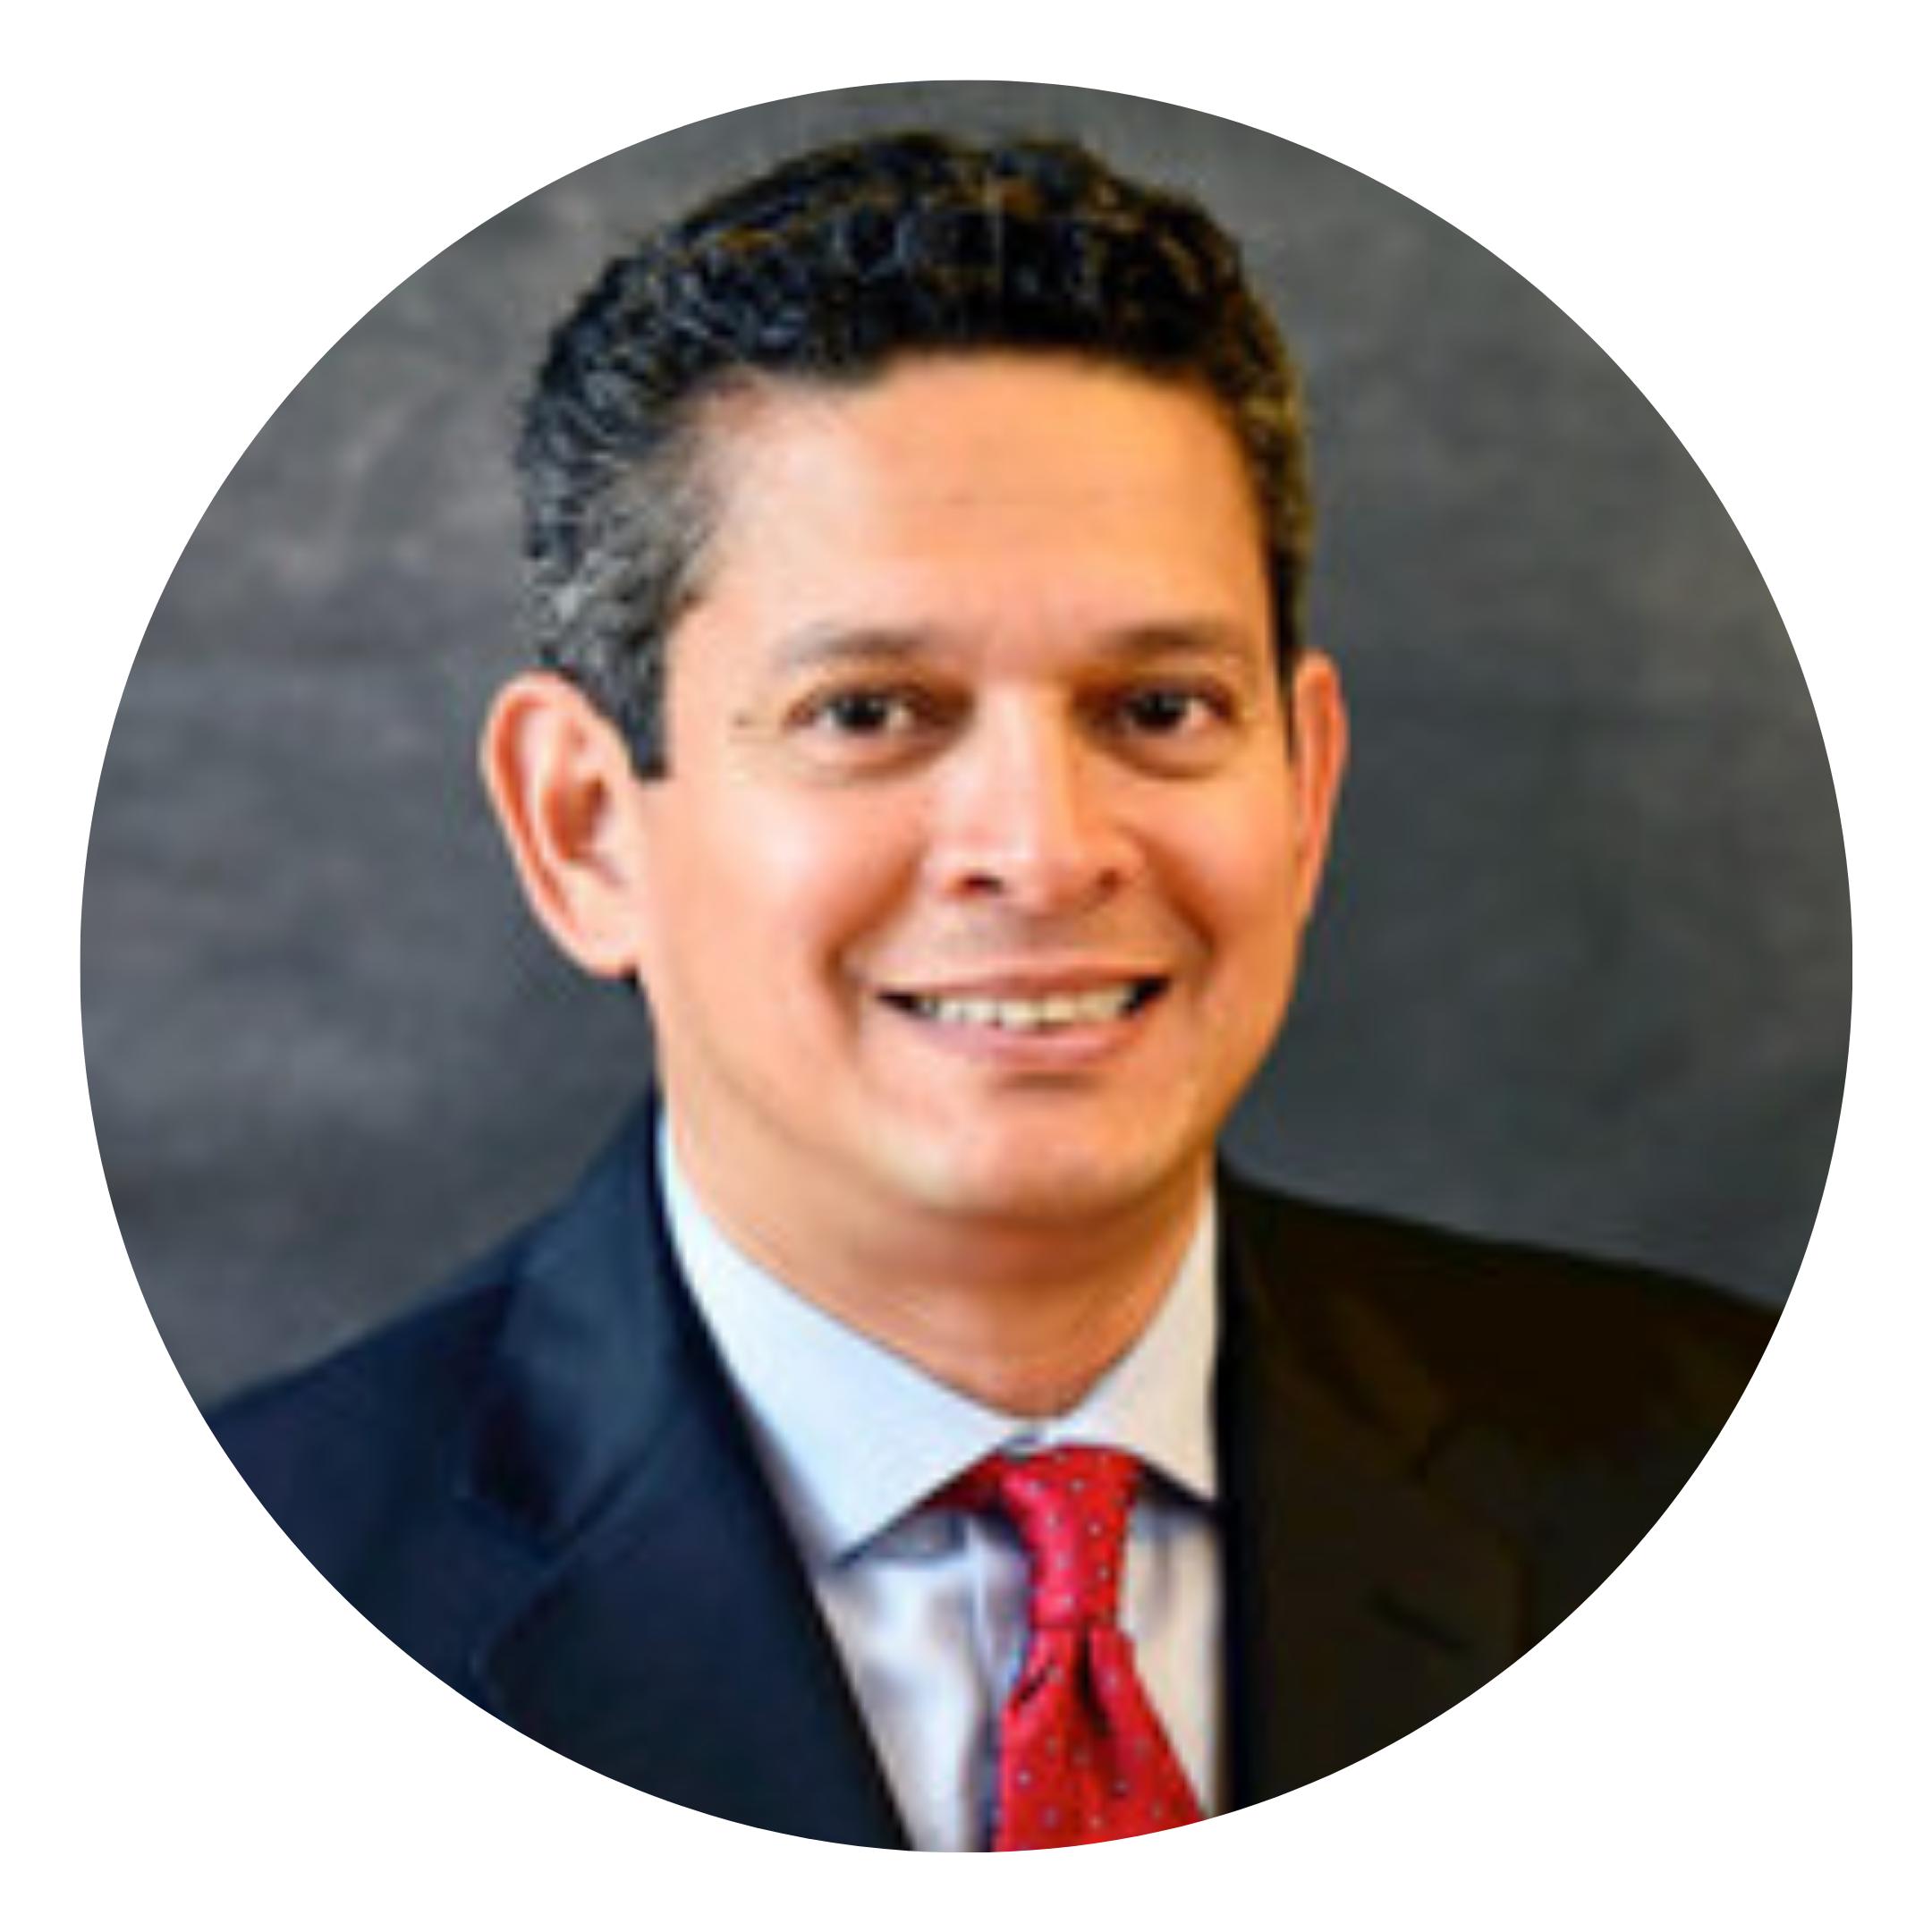 Jose Carascal    Director Site Operations , Corteva Agriscience